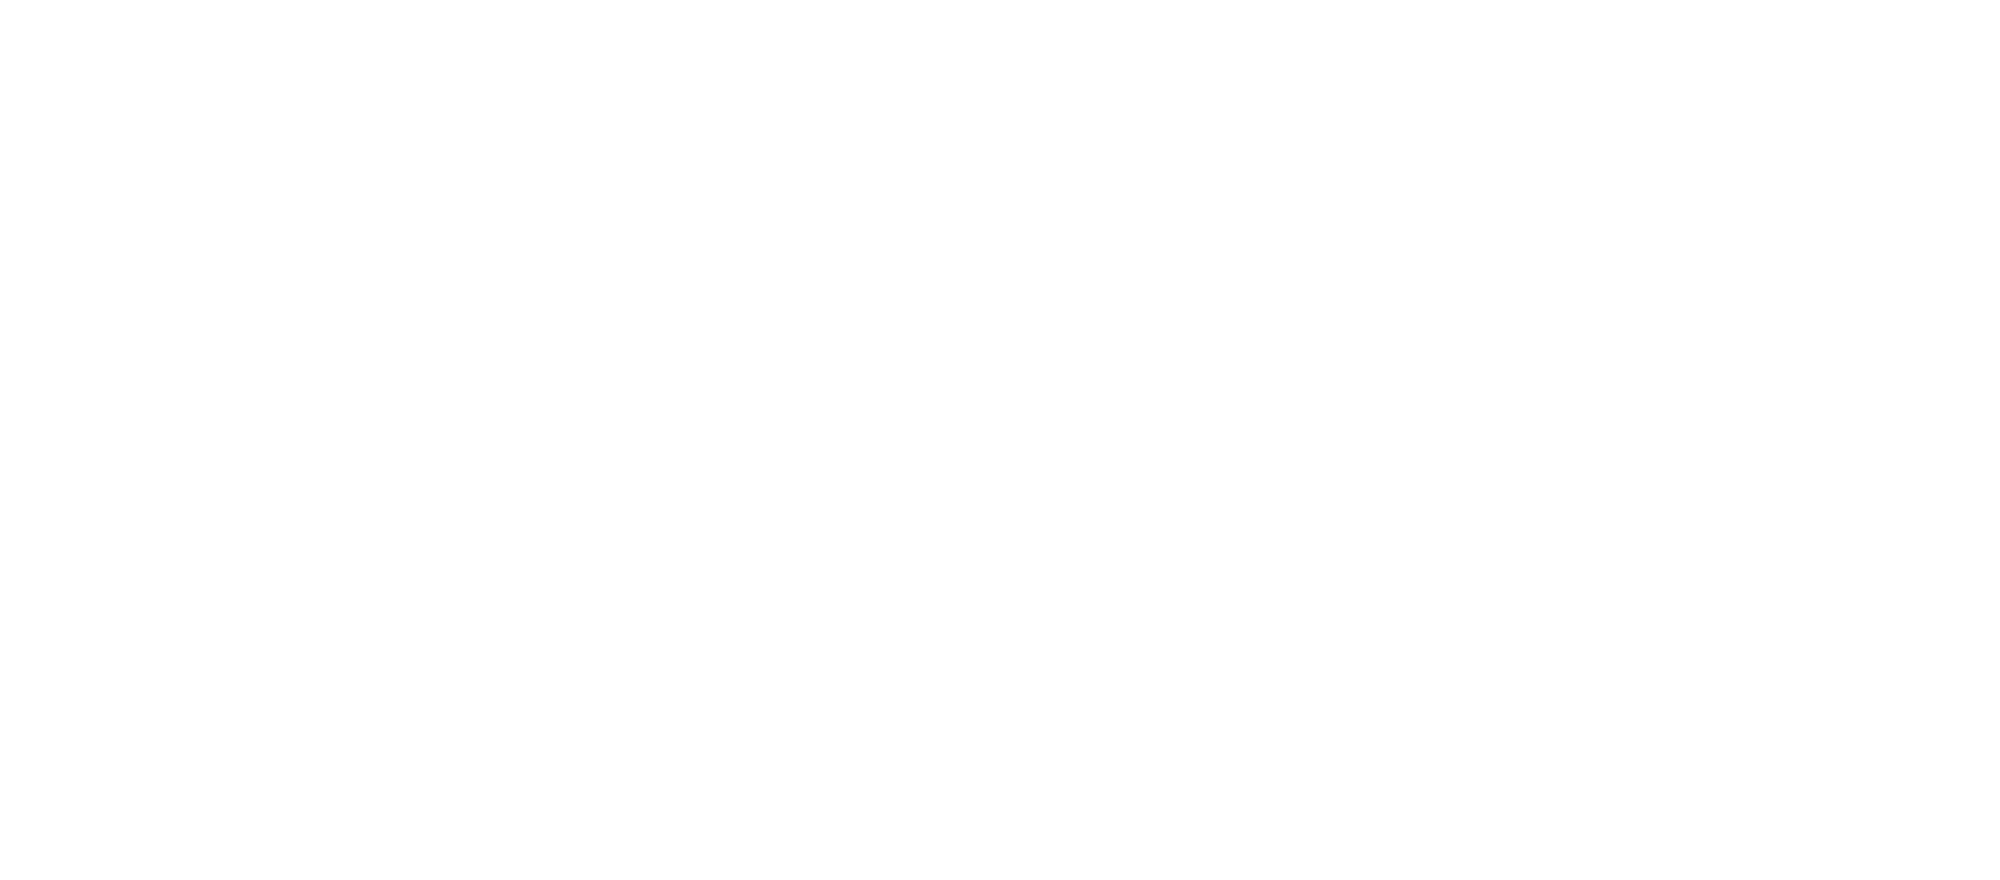 Duke University Caigcircuitwriterpen Click To Enlarge Brand Caig Laboratories